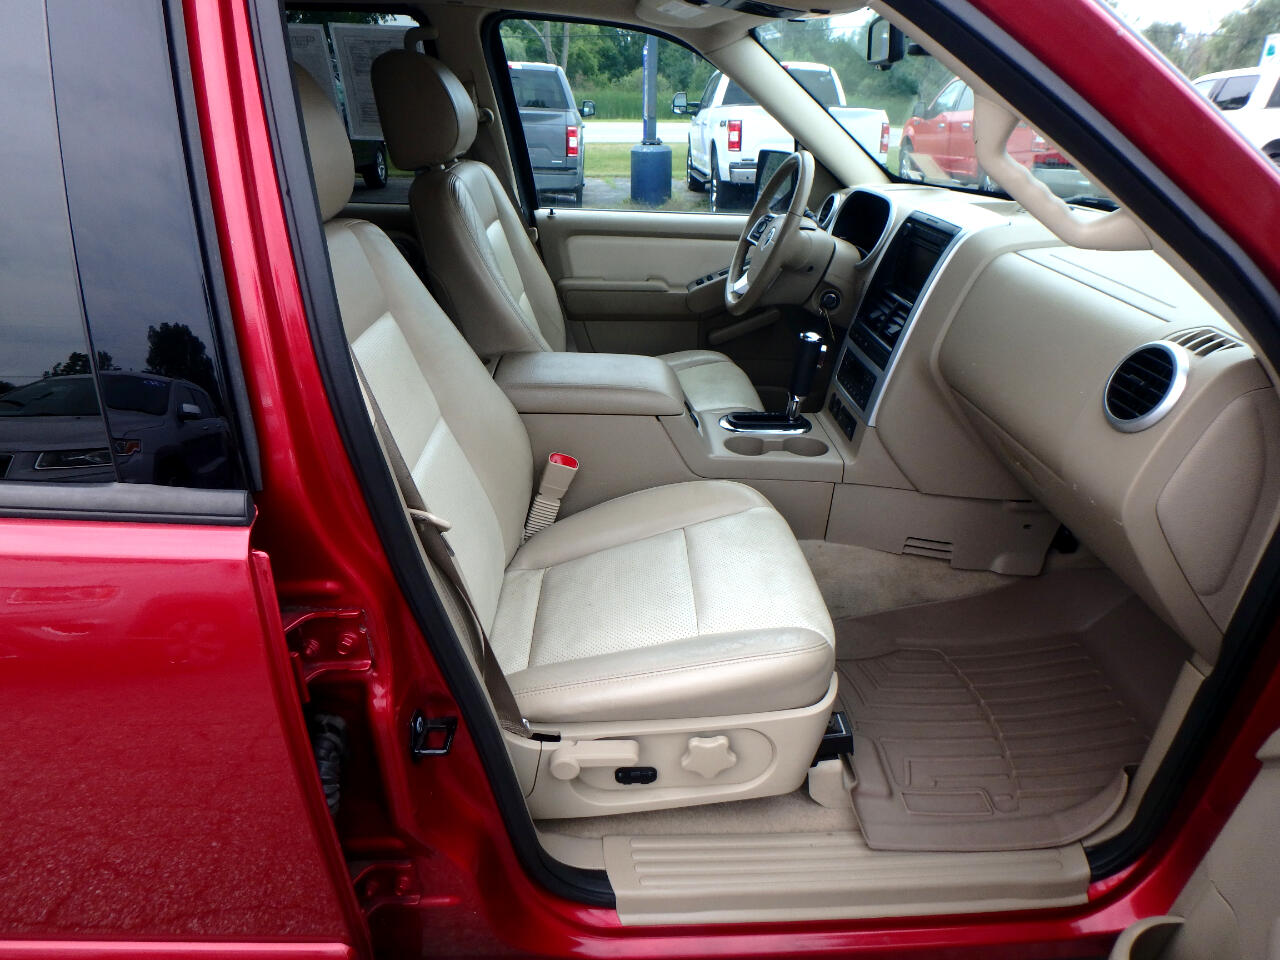 2007 Mercury Mountaineer AWD 4dr V8 Premier